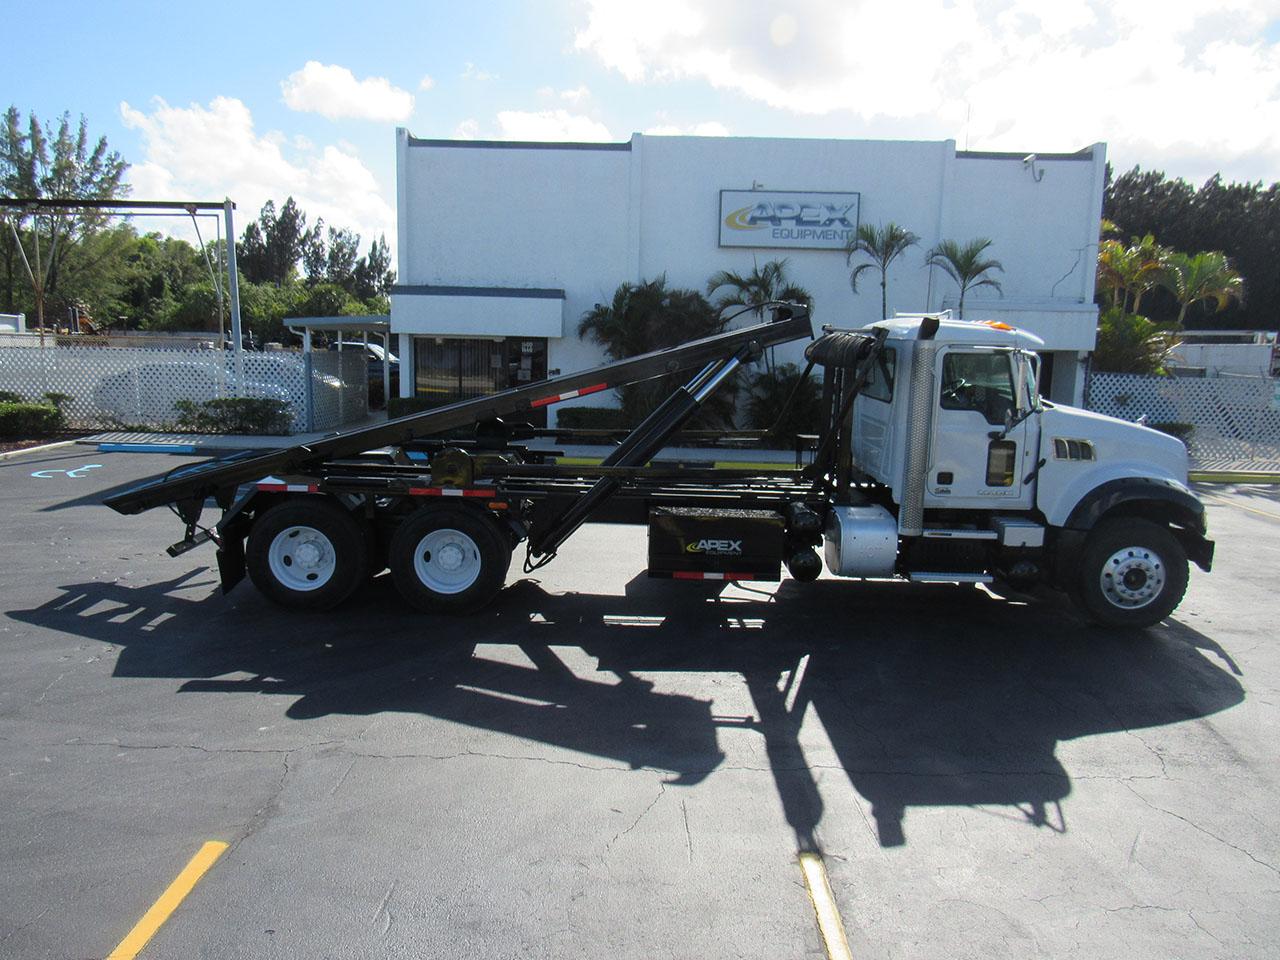 used 2013 Mack GU713 in West Palm Beach, FL